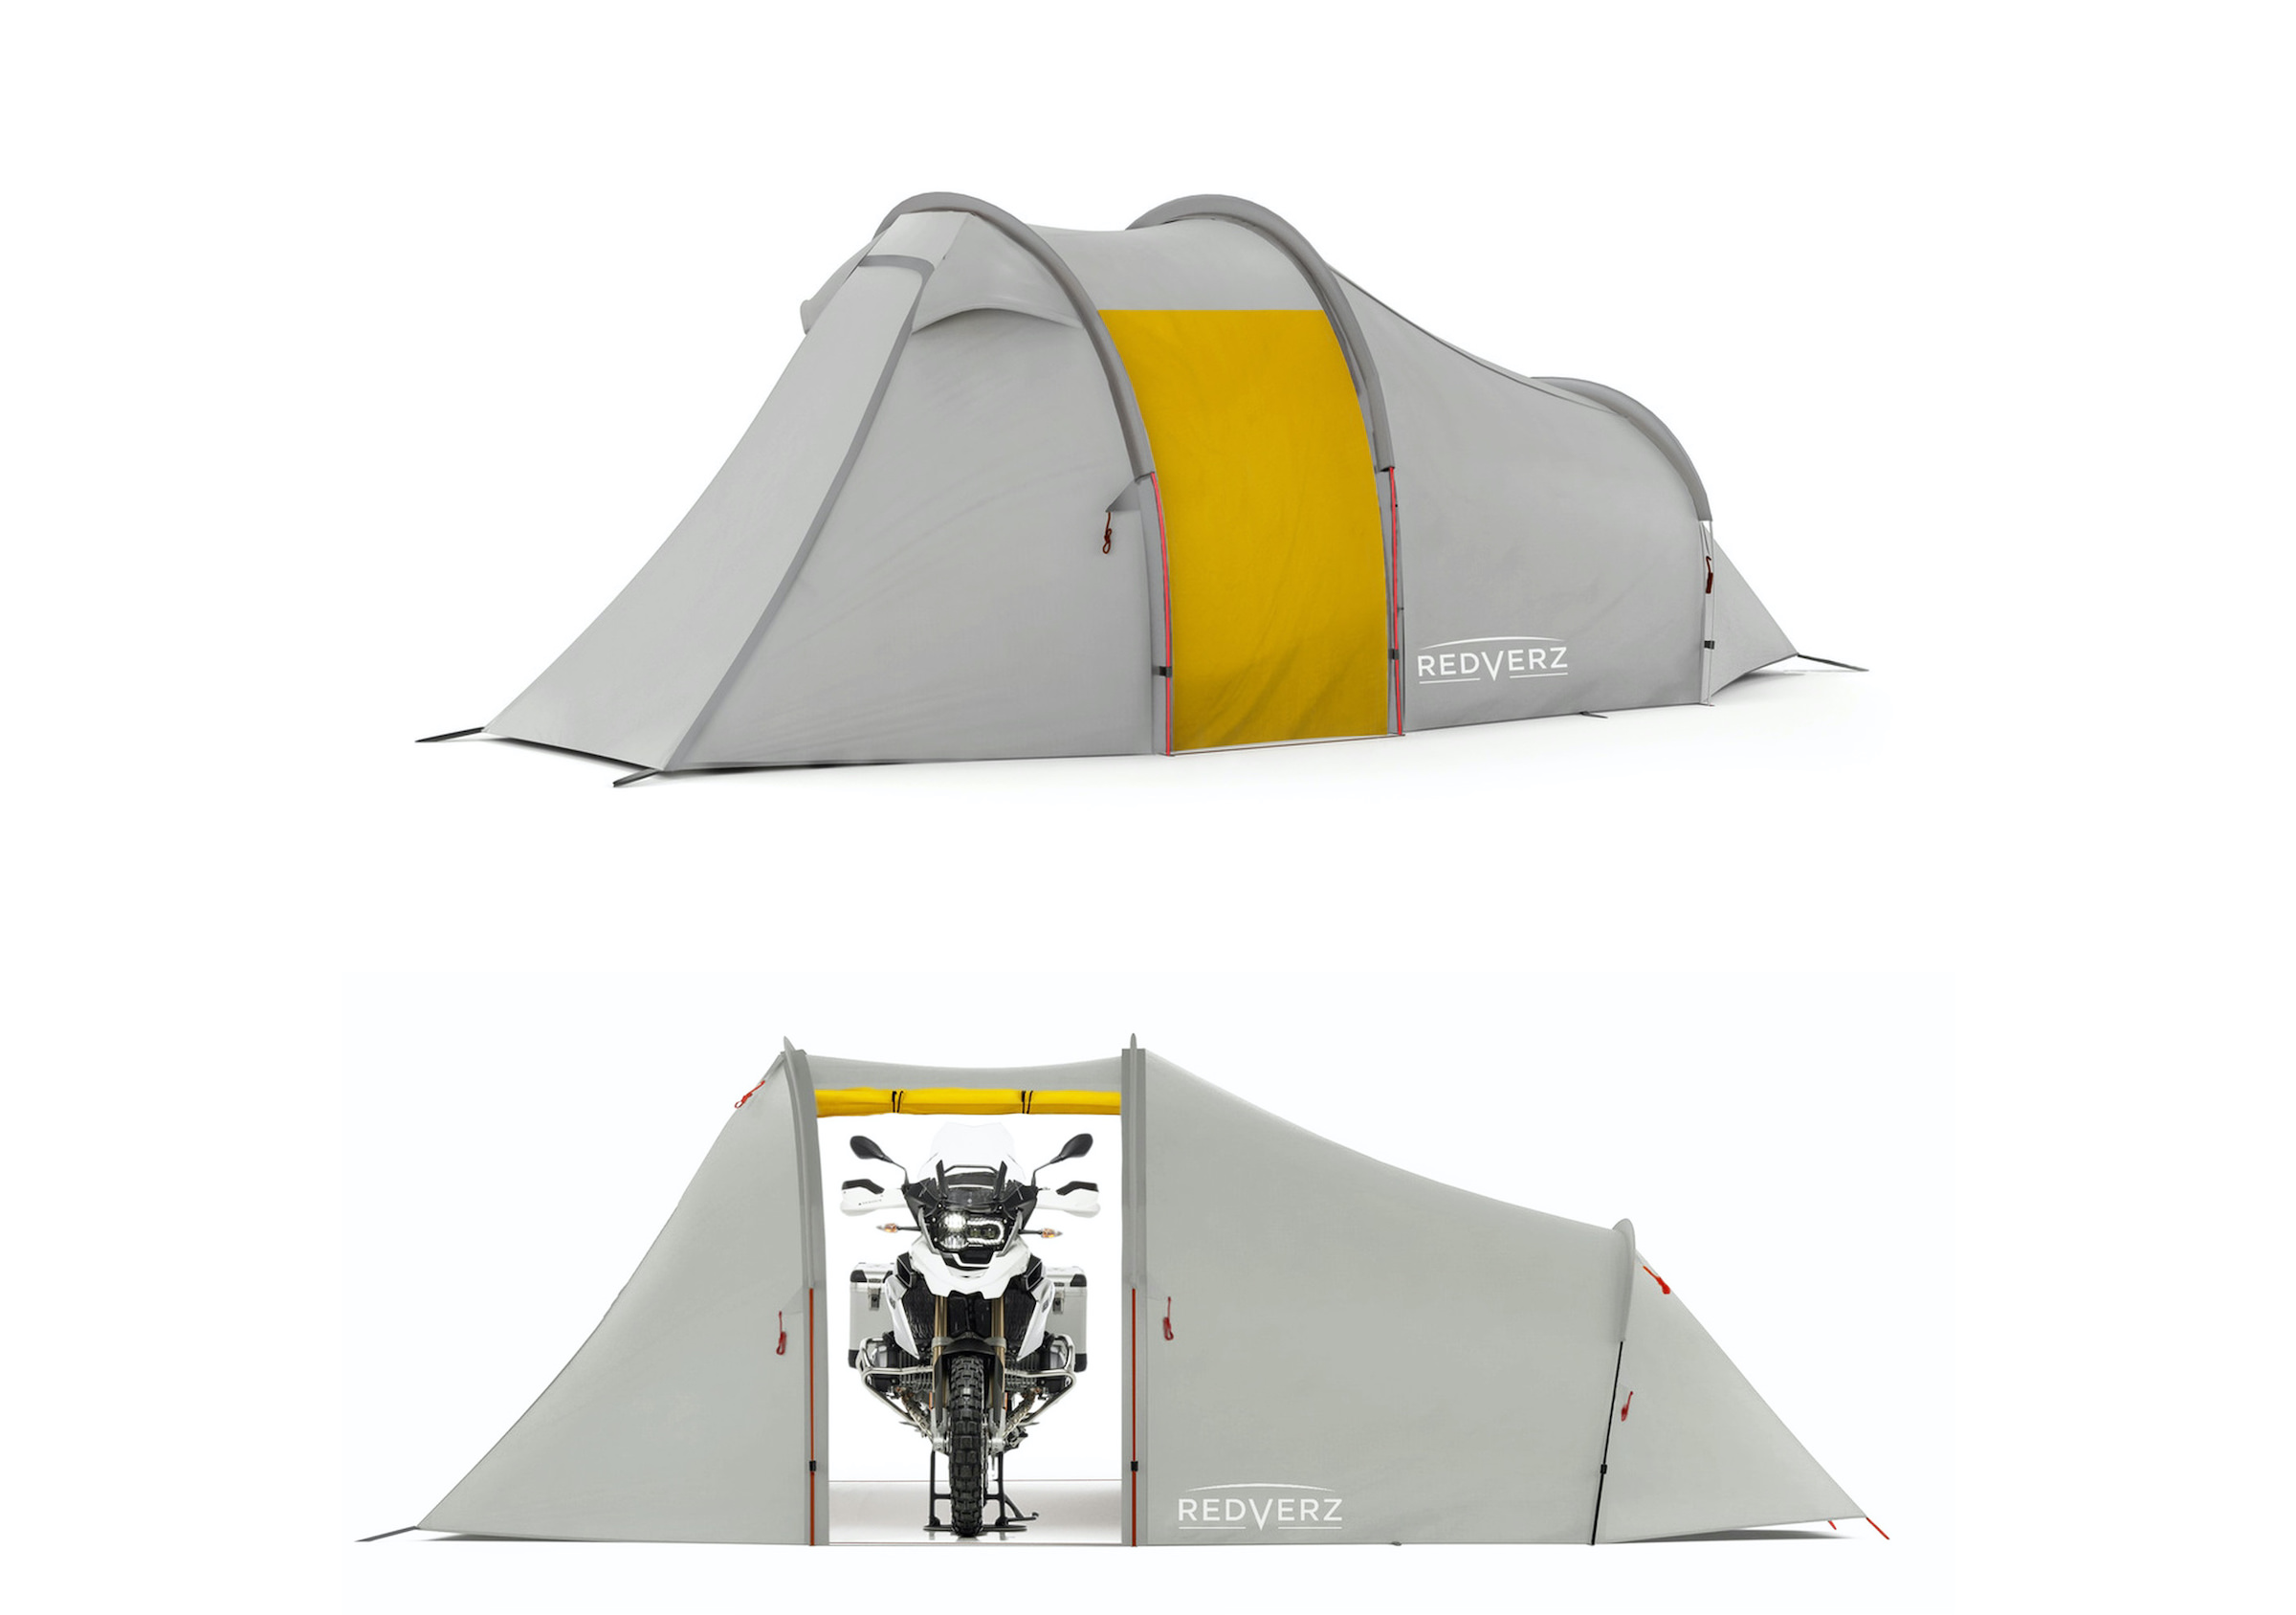 Redverz Atacama Expedition Motorcycle Tent